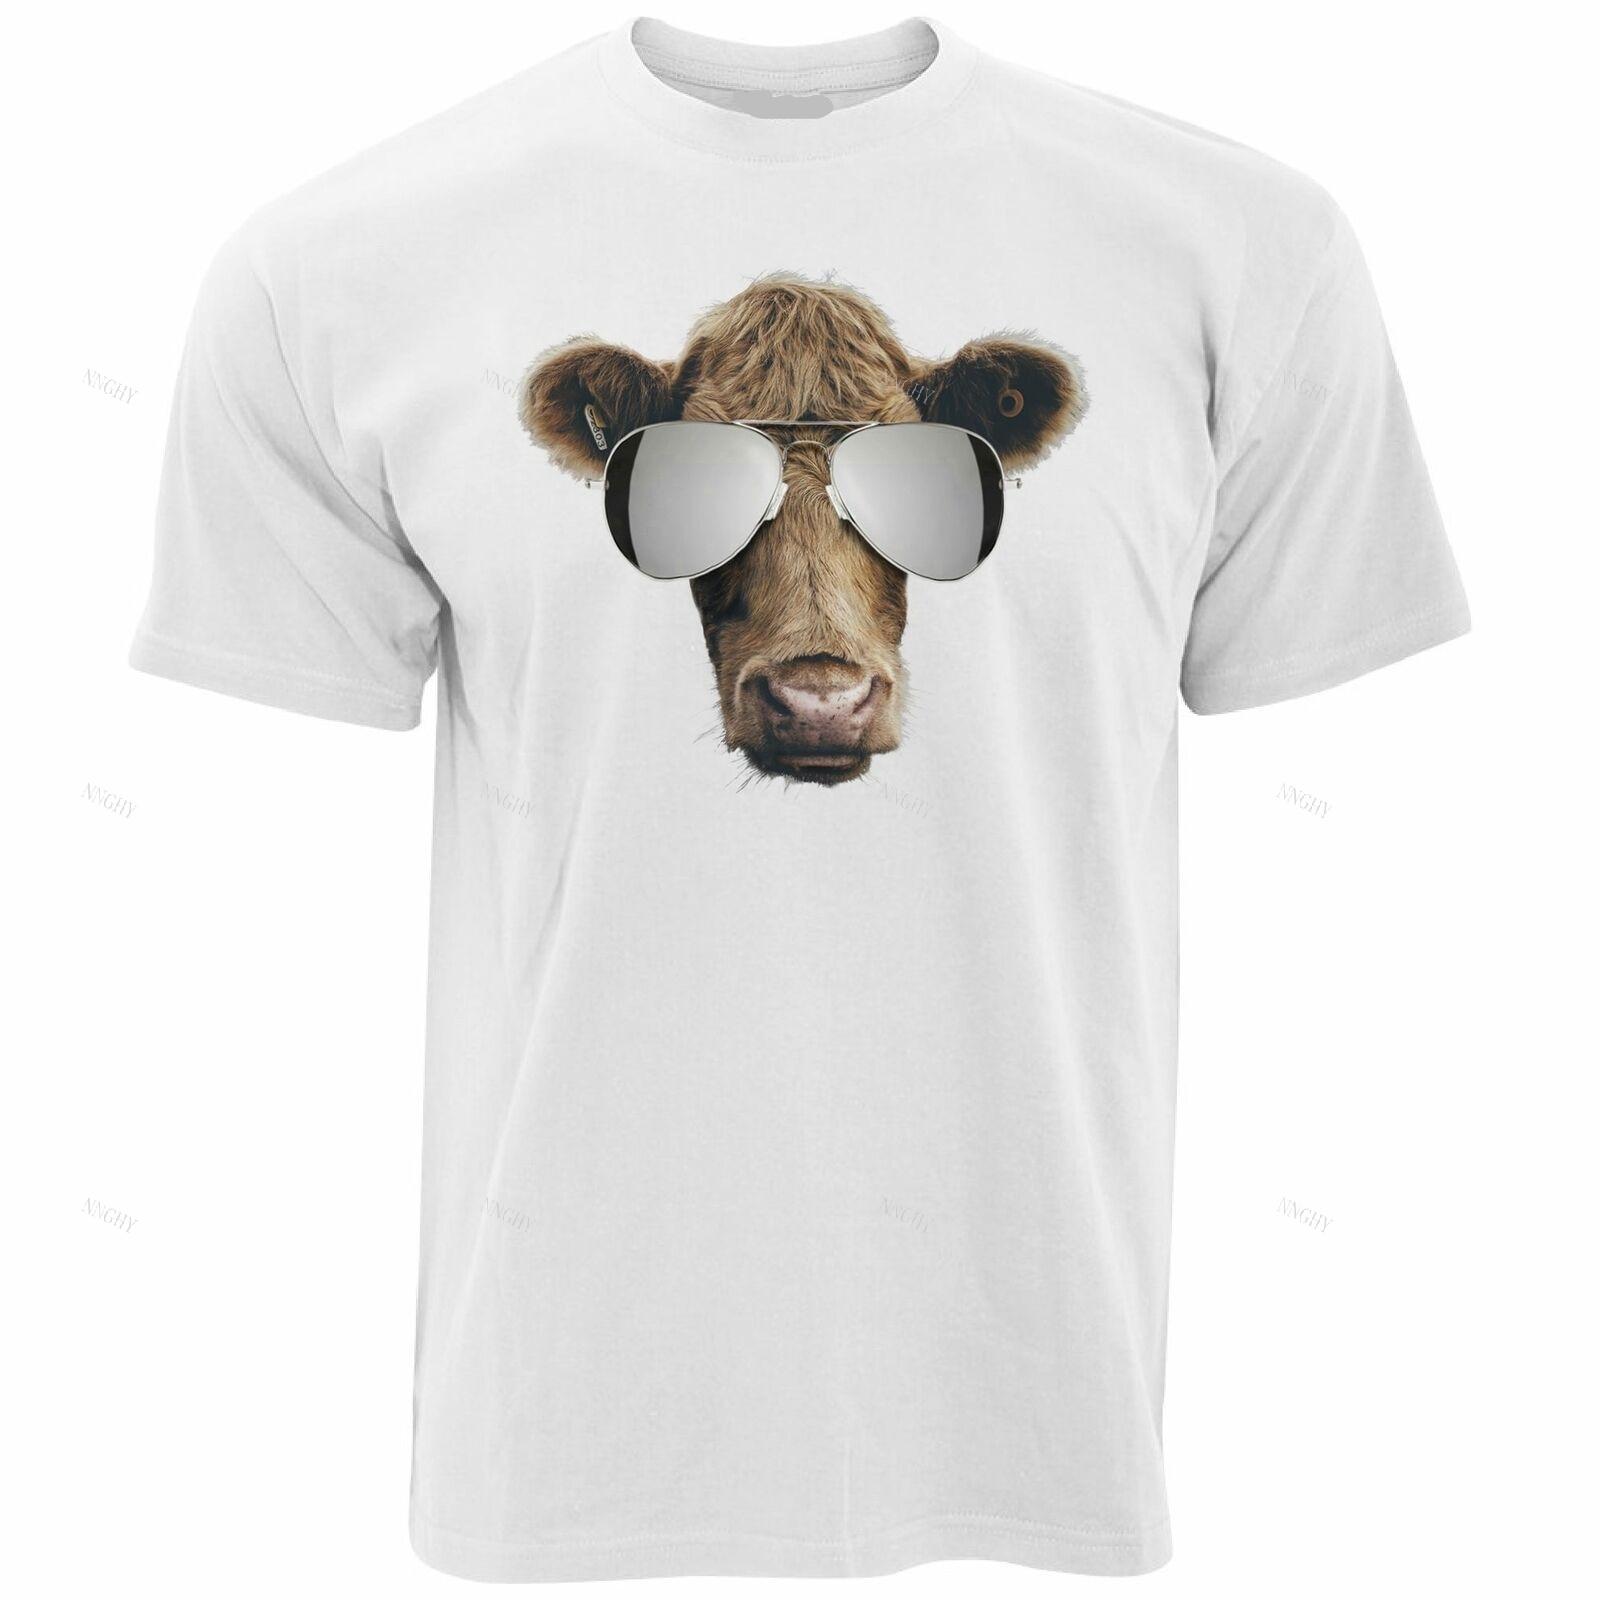 Summer Art T Shirt Cow Wearing Aviator Sunglasses Silly Stylish Hipster